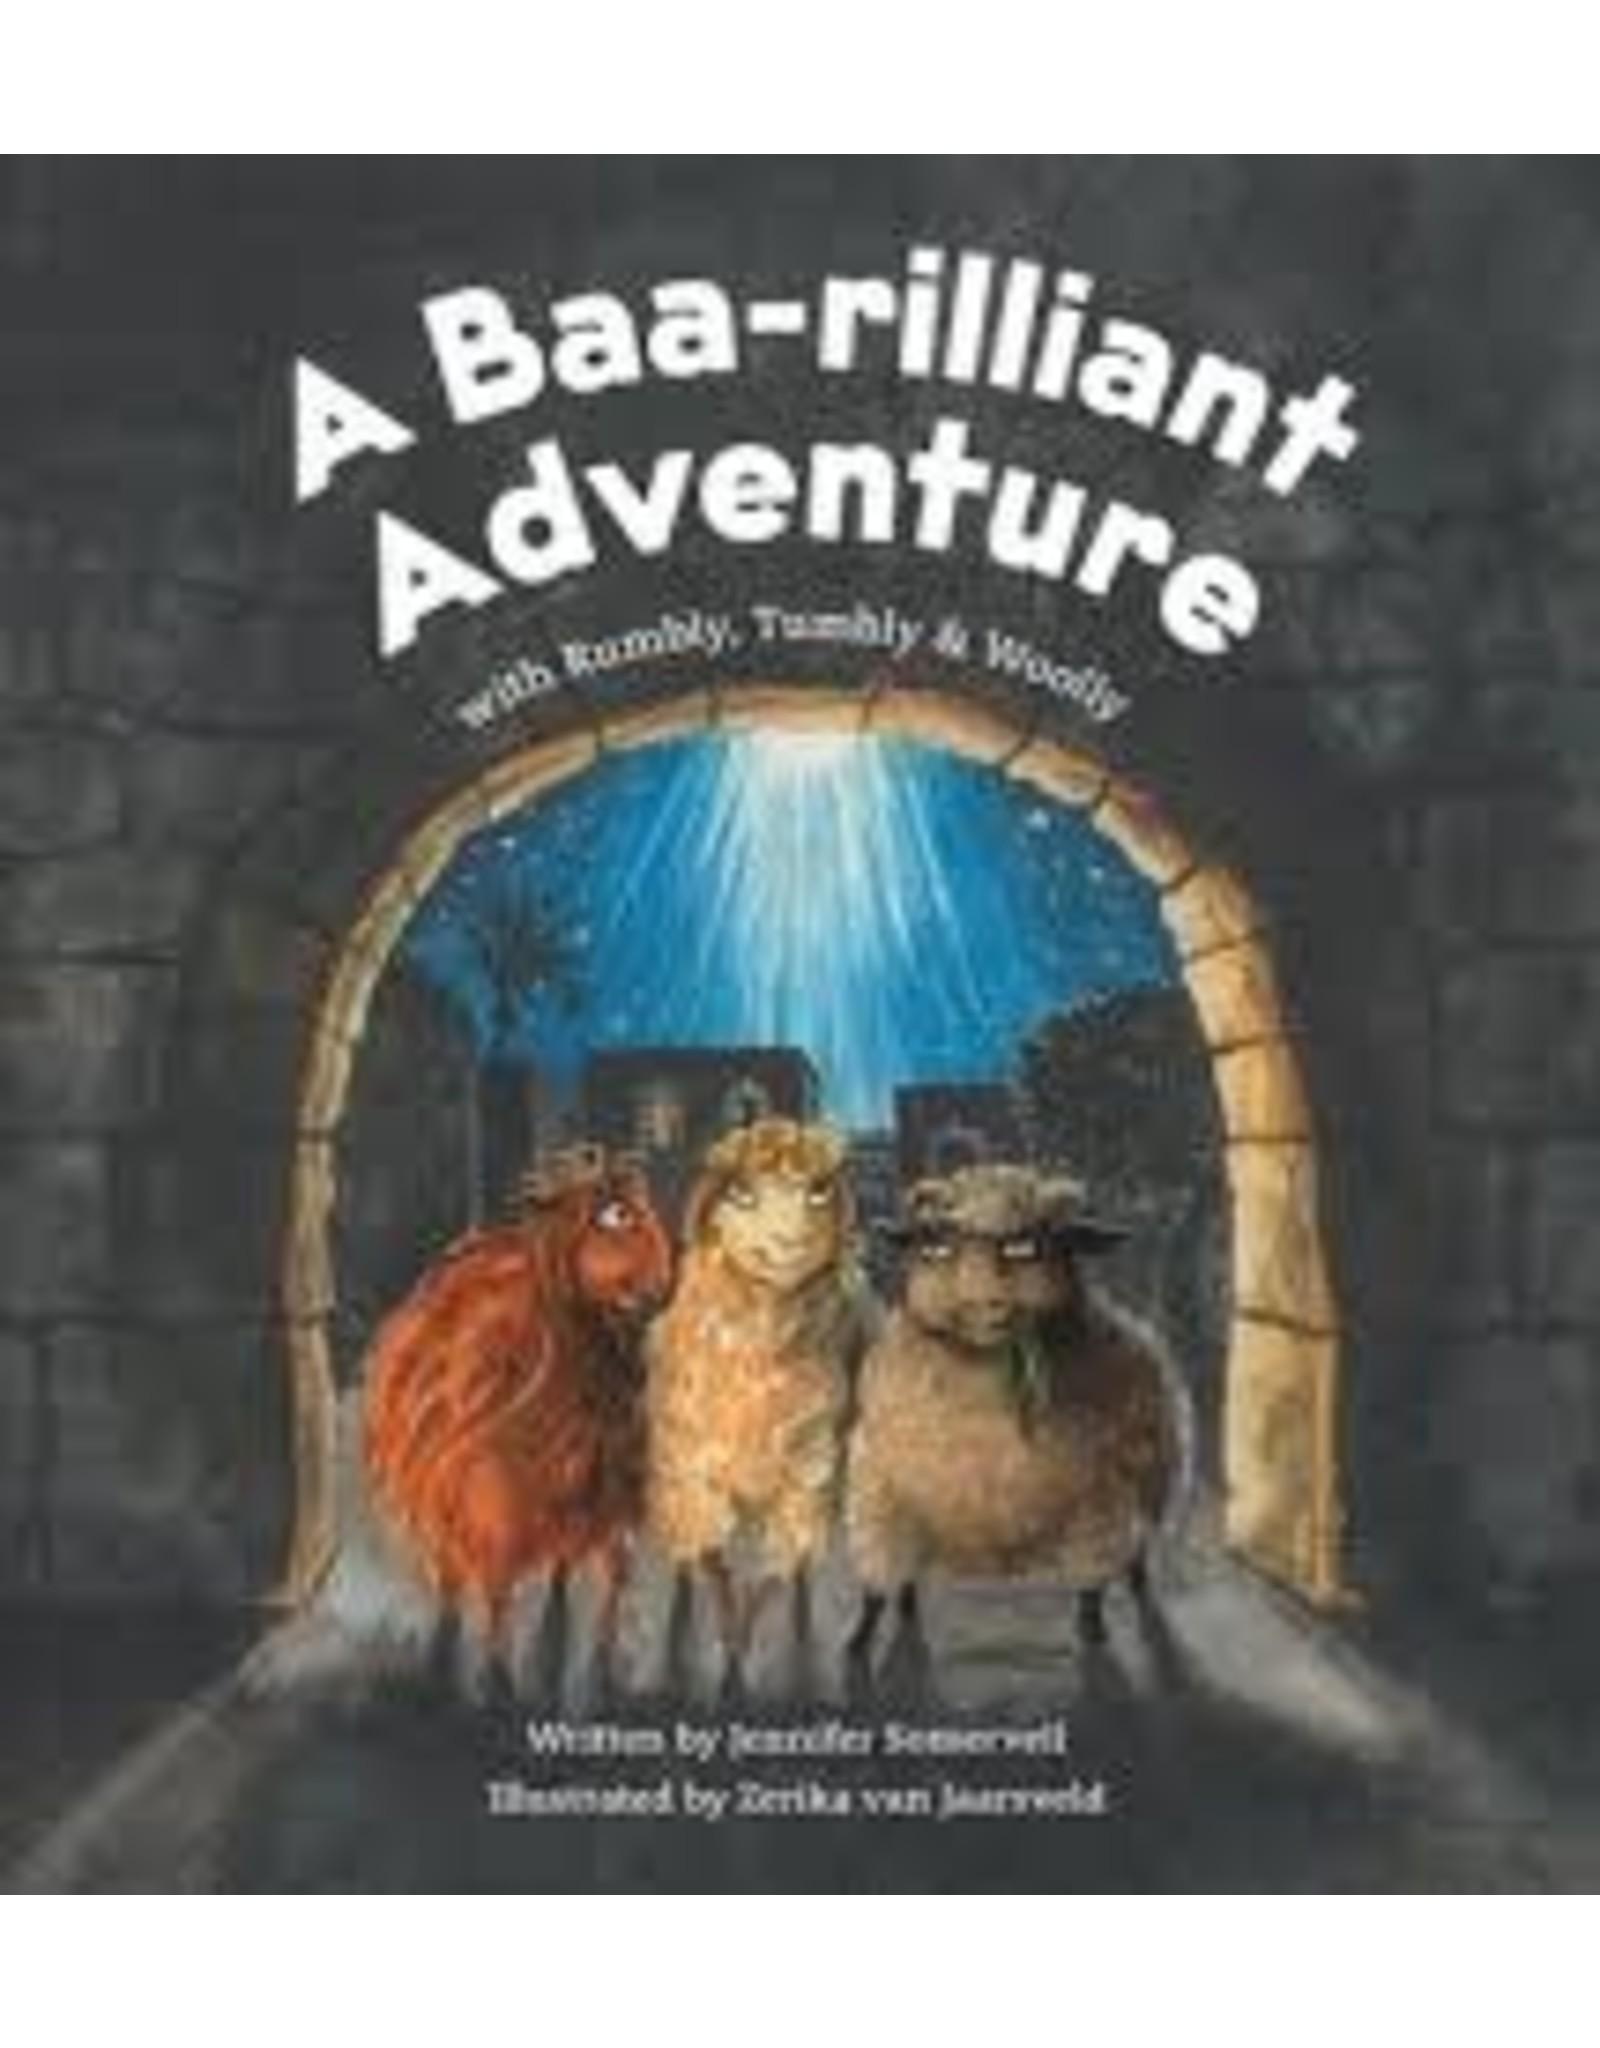 Somervell A Baa-rilliant Adventure